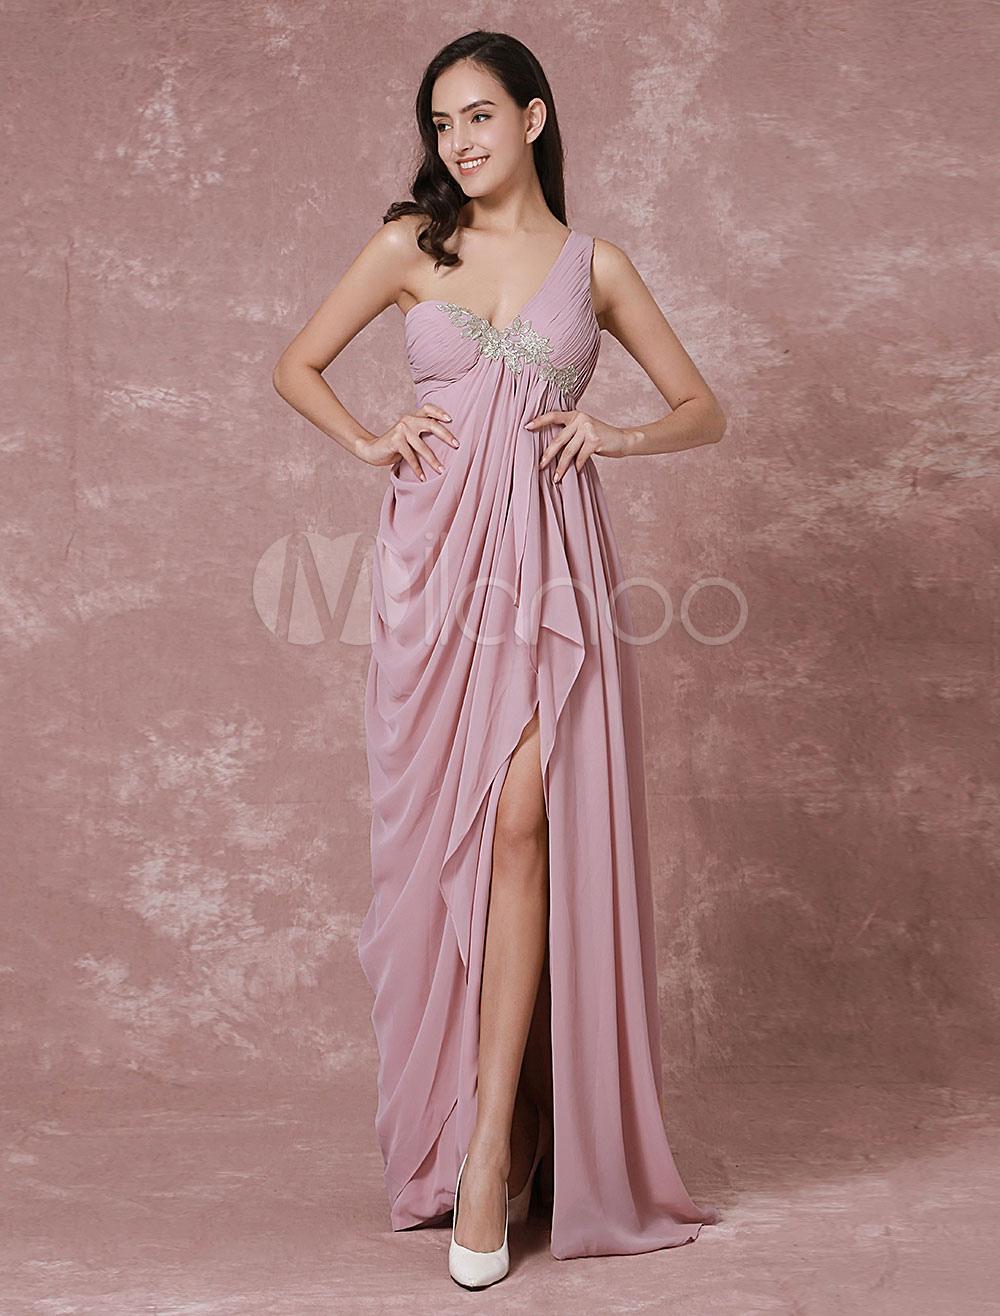 Chiffon Evening Dress Sexy Split One Shoulder Red Carpet Dress Maxi Backless Lace Applique Party Dress